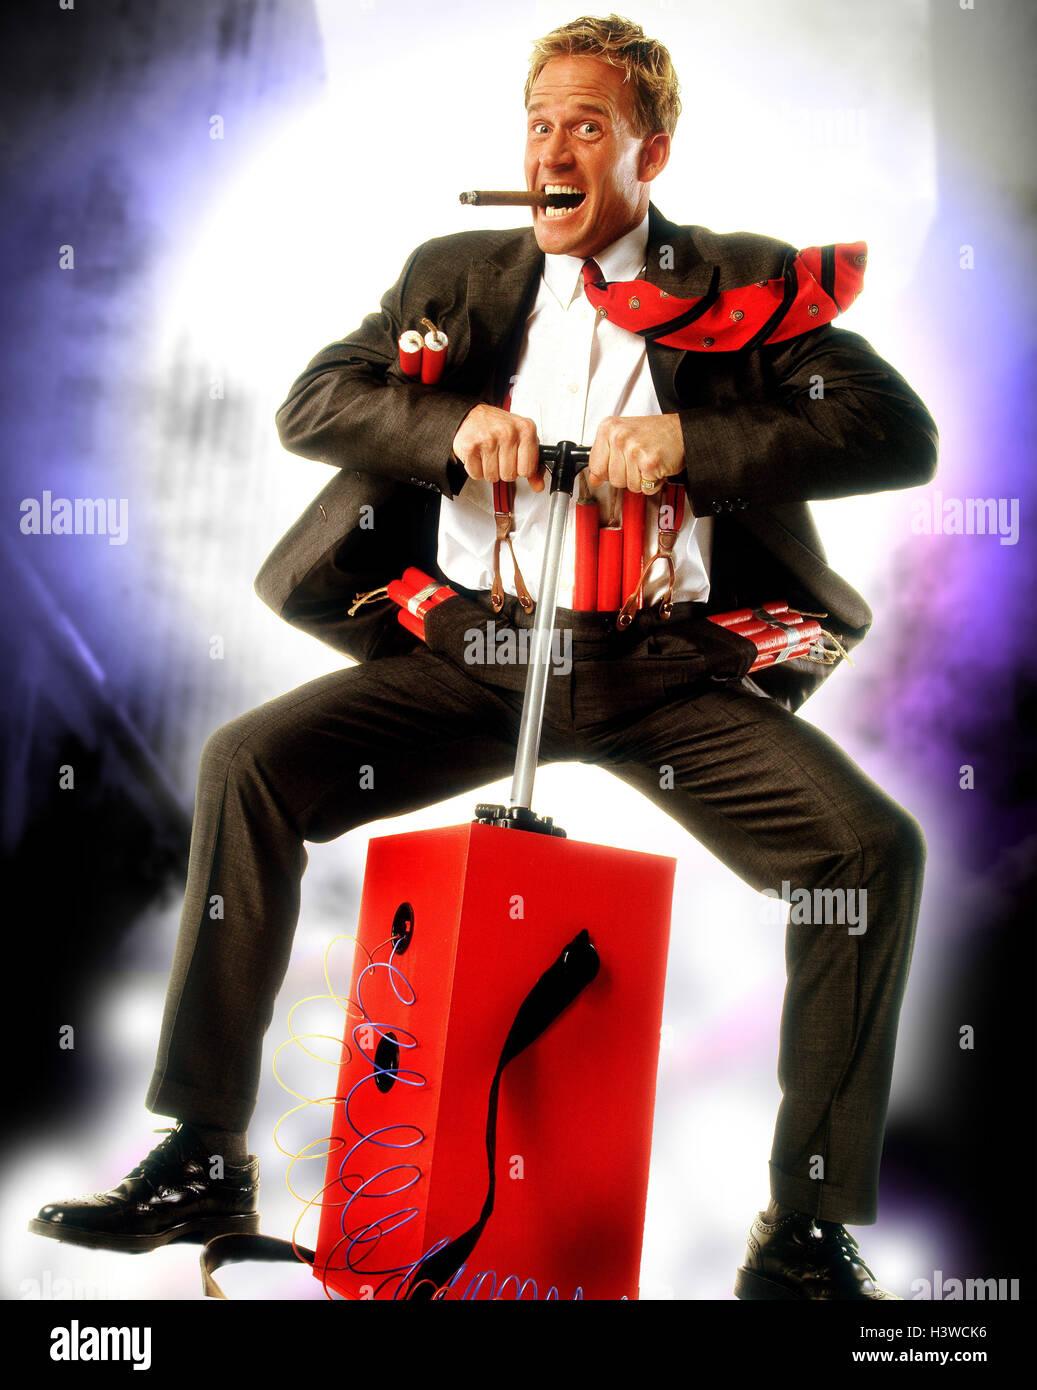 Businessman, cigar, dynamite, explosive charge, ignition mechanism, trigger, gesture [M] concepts, businessman, - Stock Image